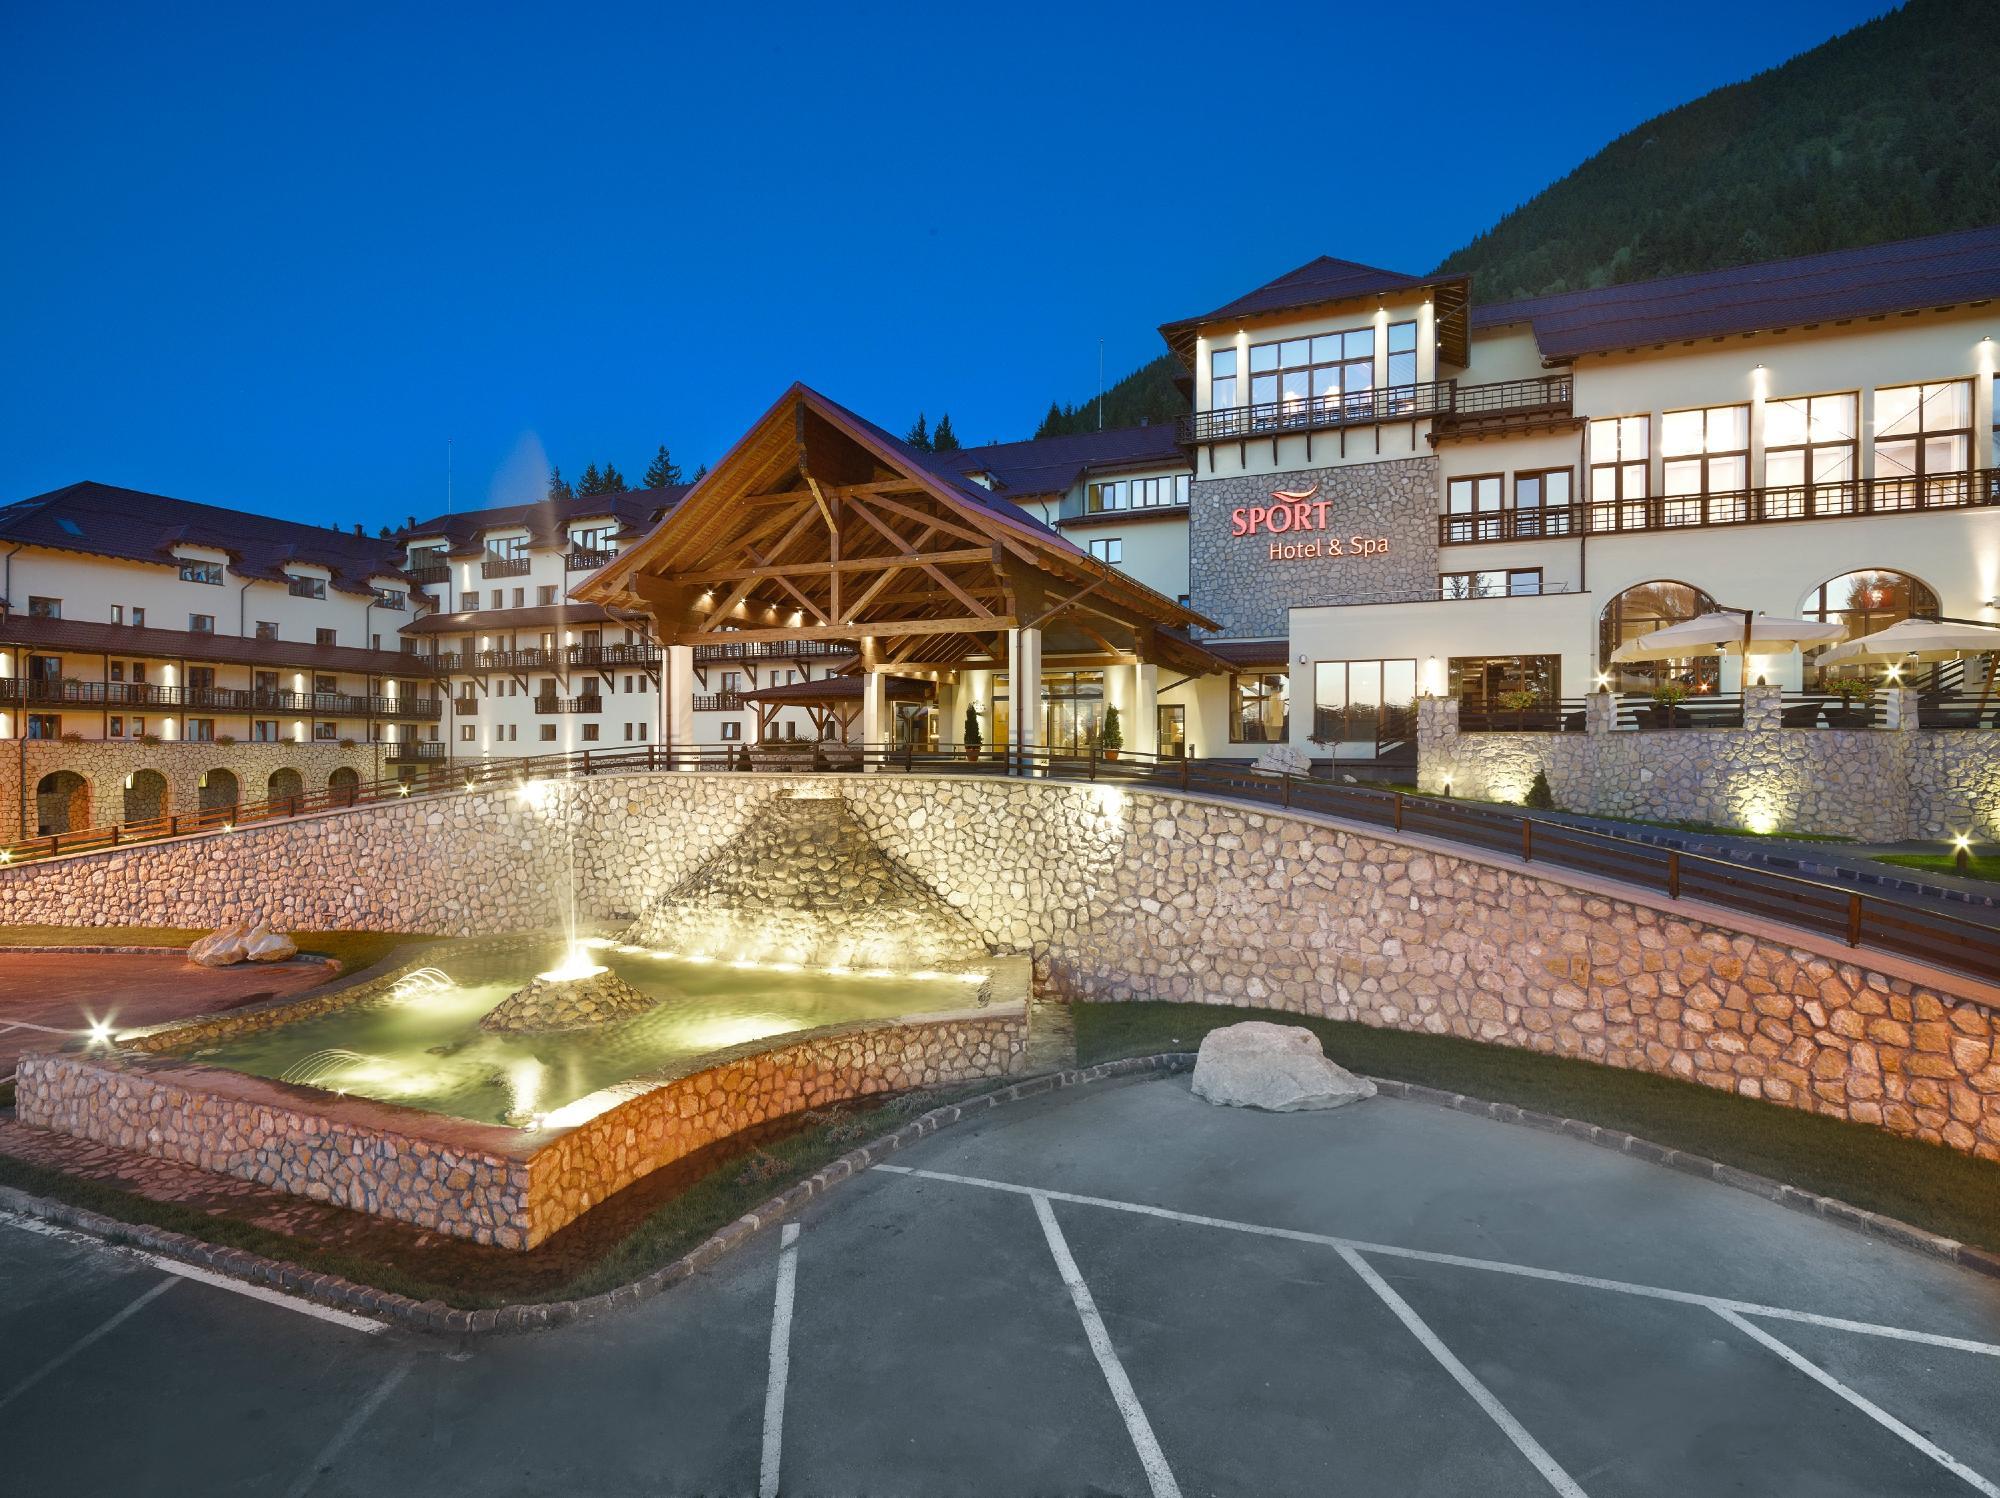 Sport Hotel & Spa